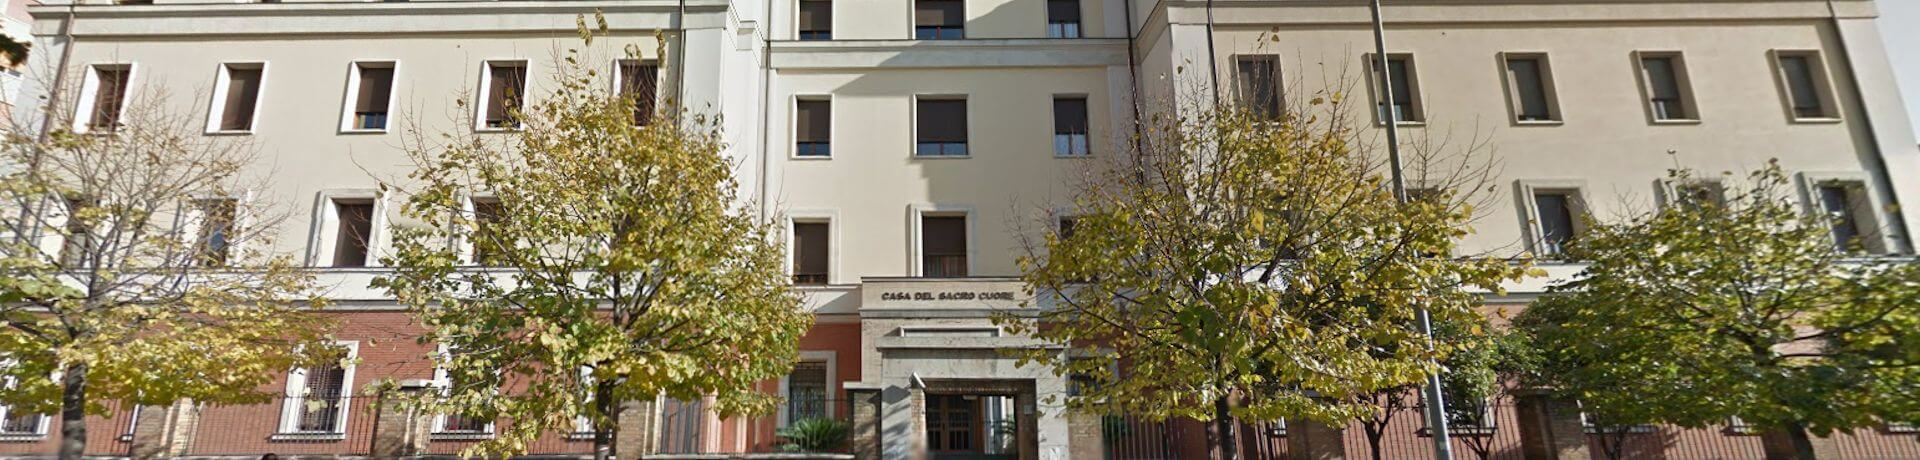 Istituto Sacro Cuore Roma Scuola Sacro Cuore - Ingresso